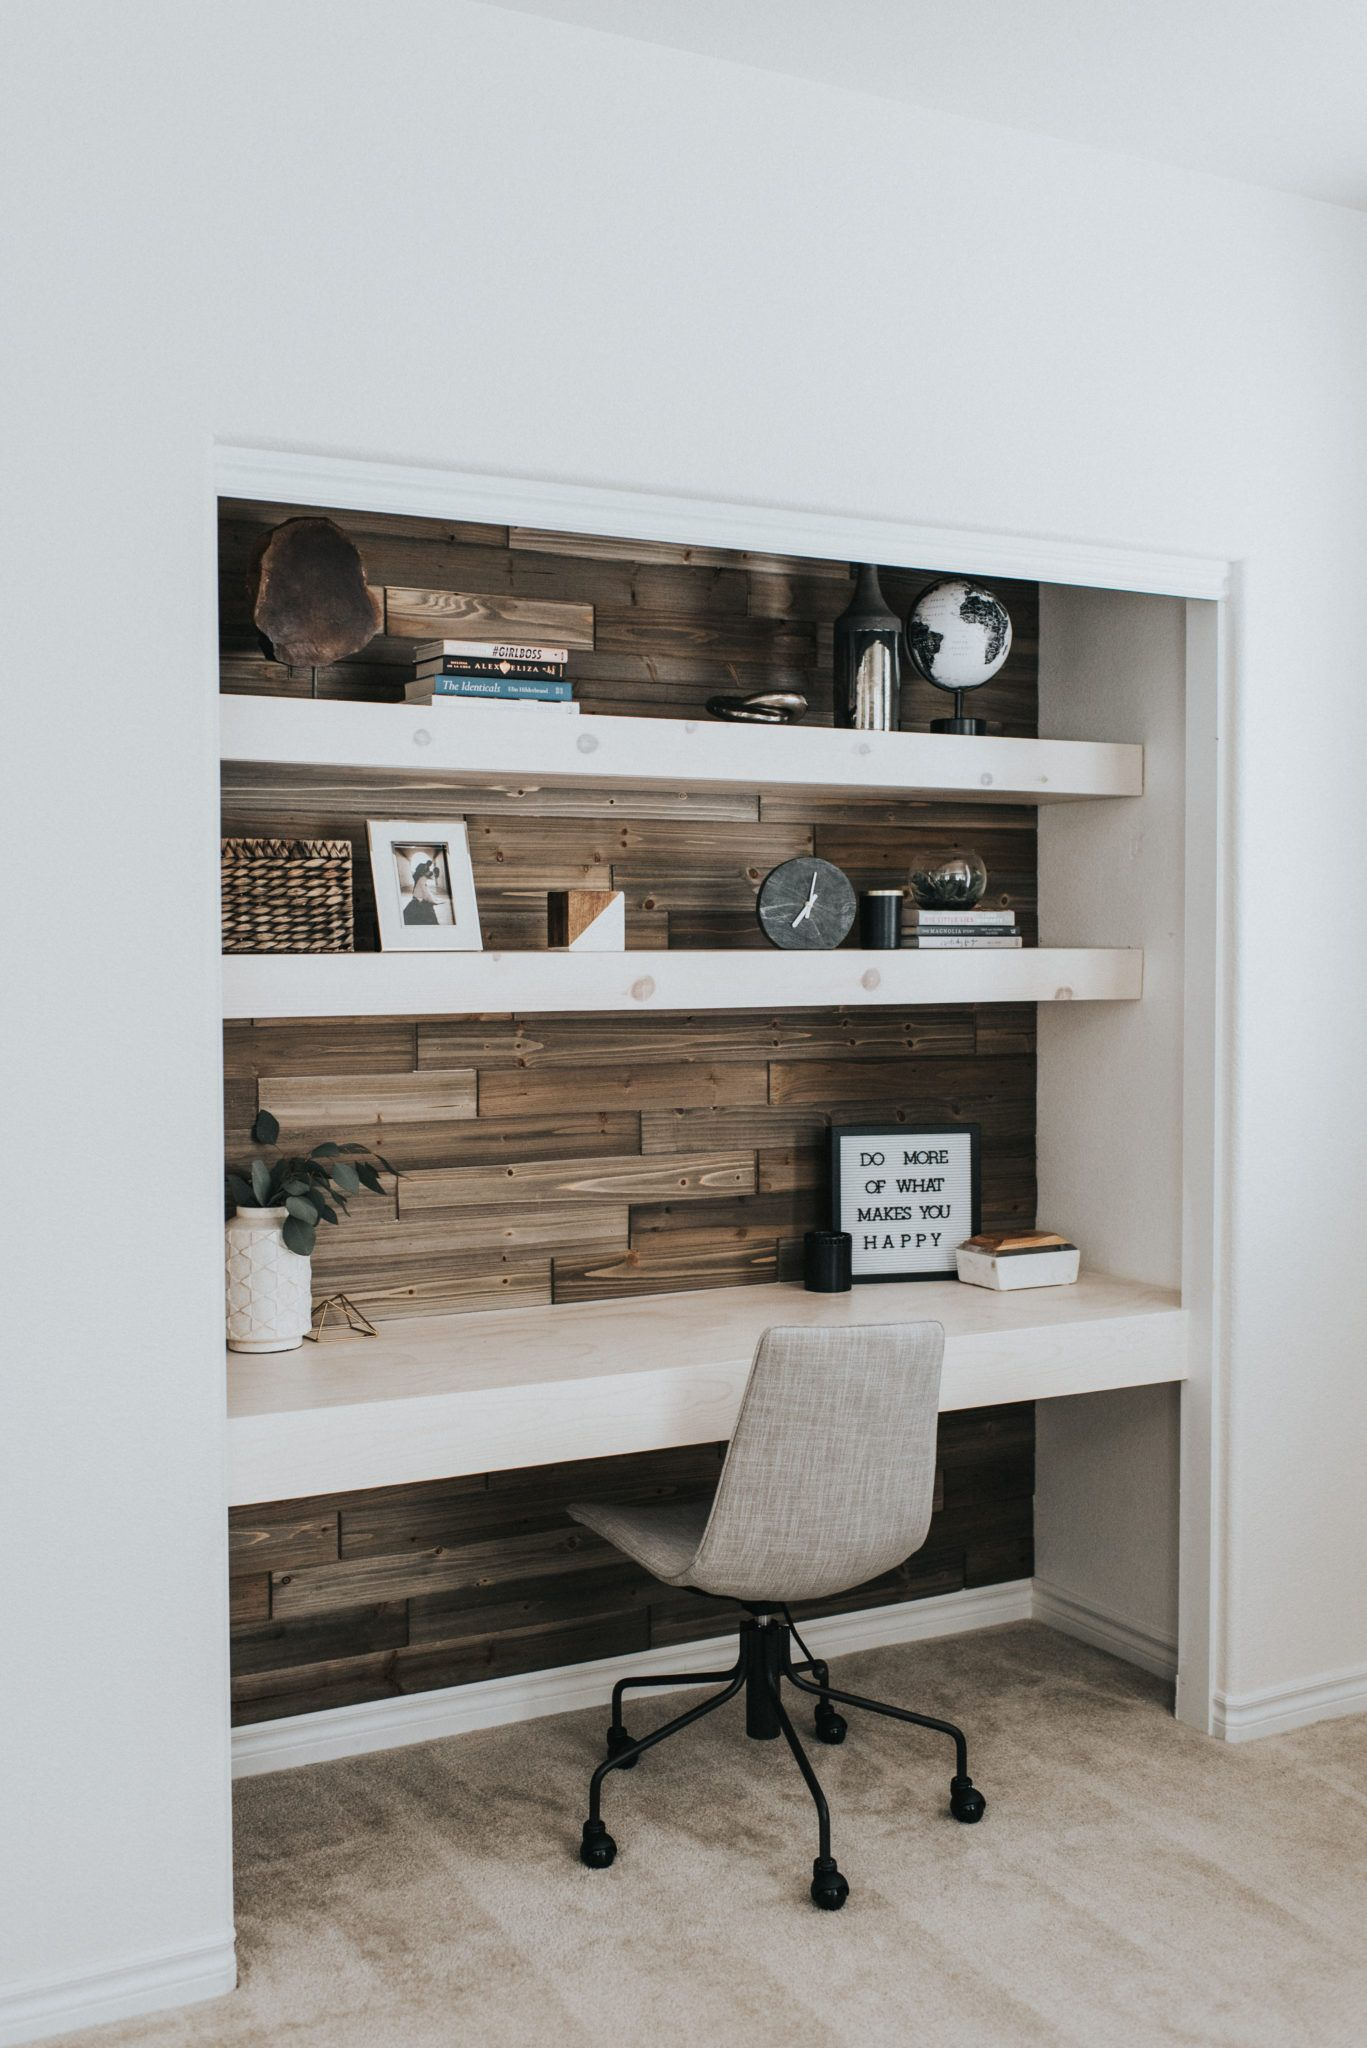 Contemporary Office Ideas Diy Closet Office Outfits Outings Home Office Closet Home Office Decor Home Office Design